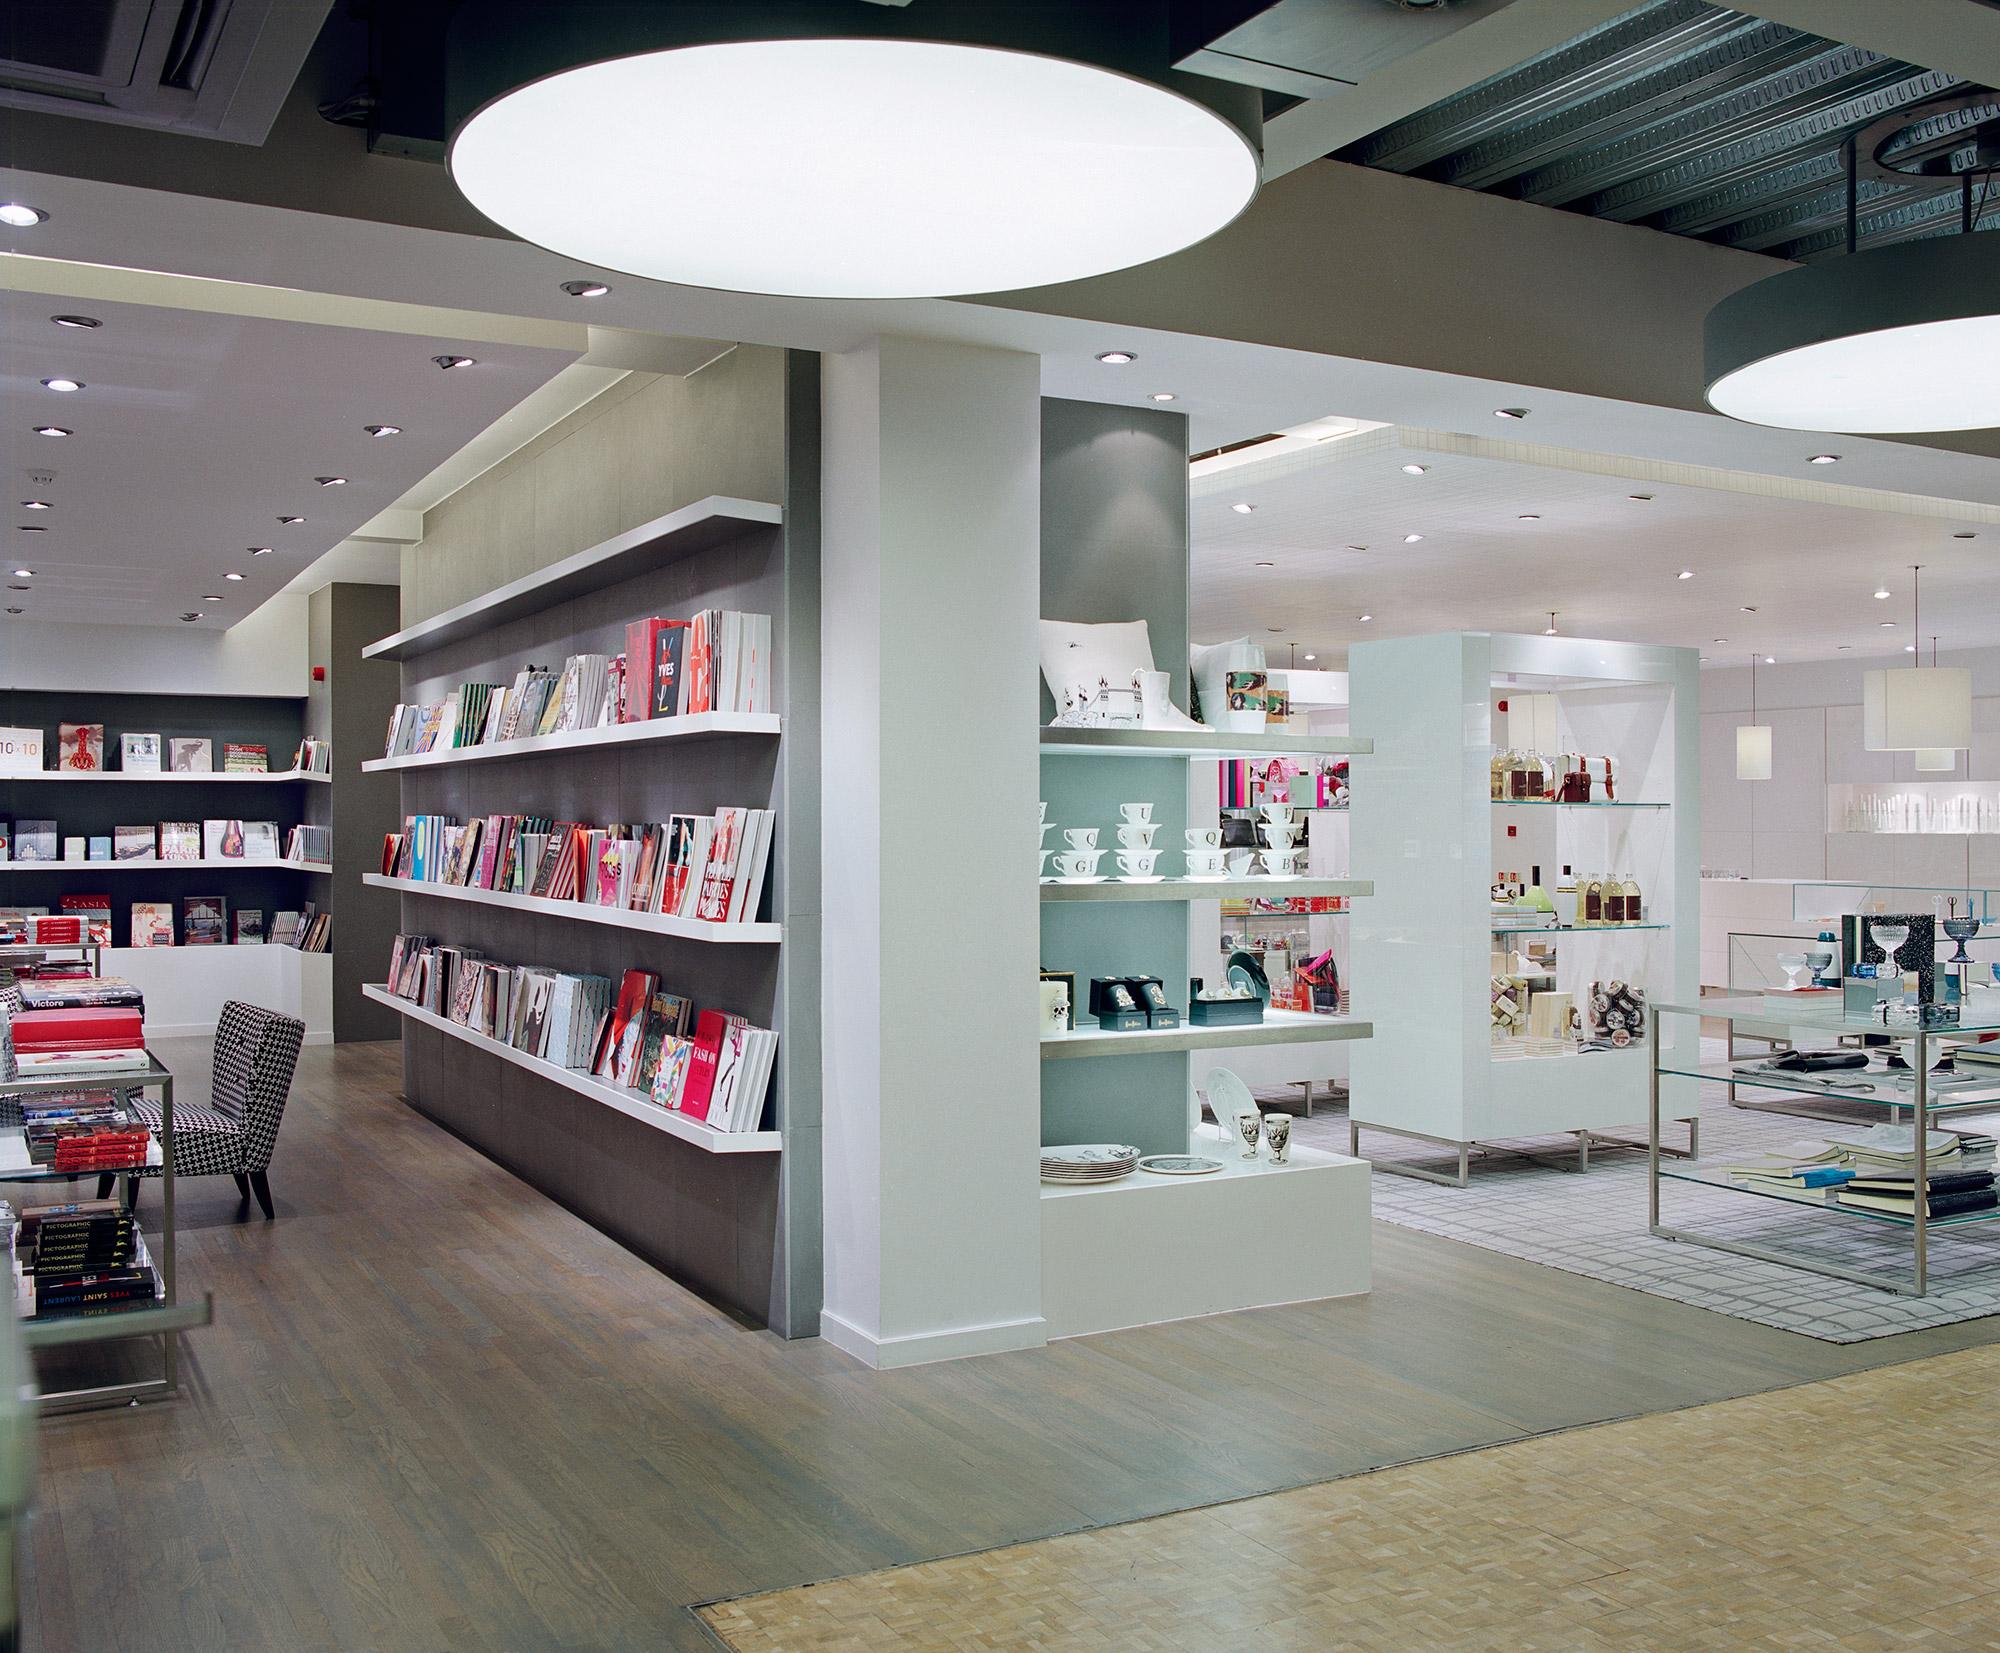 Paperchase Tottenham Court Road, white book shelves, large circular light